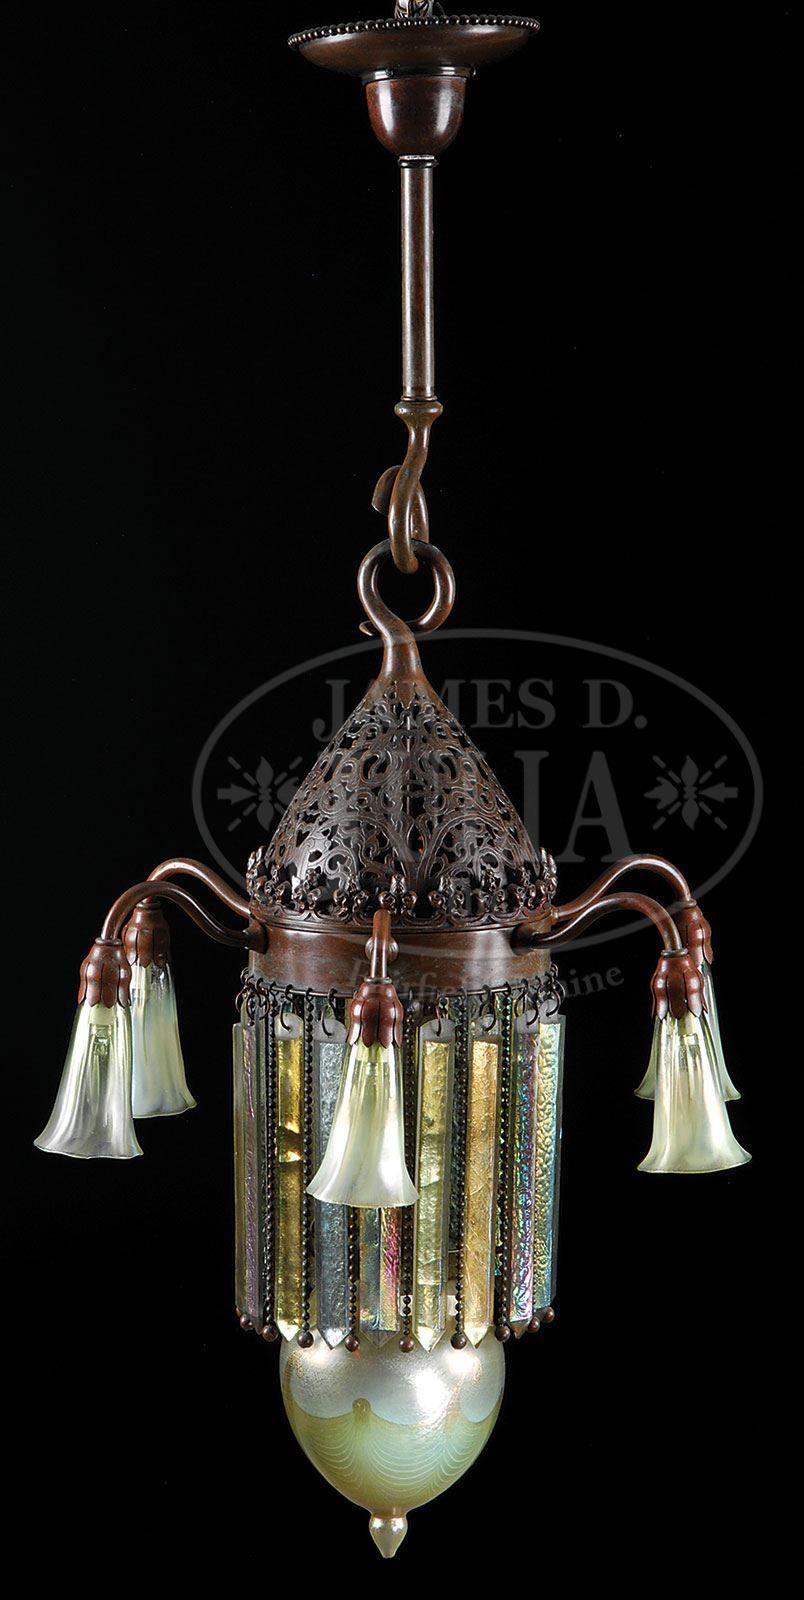 Tiffany Studios Prism Chandelier Est 45 000 55